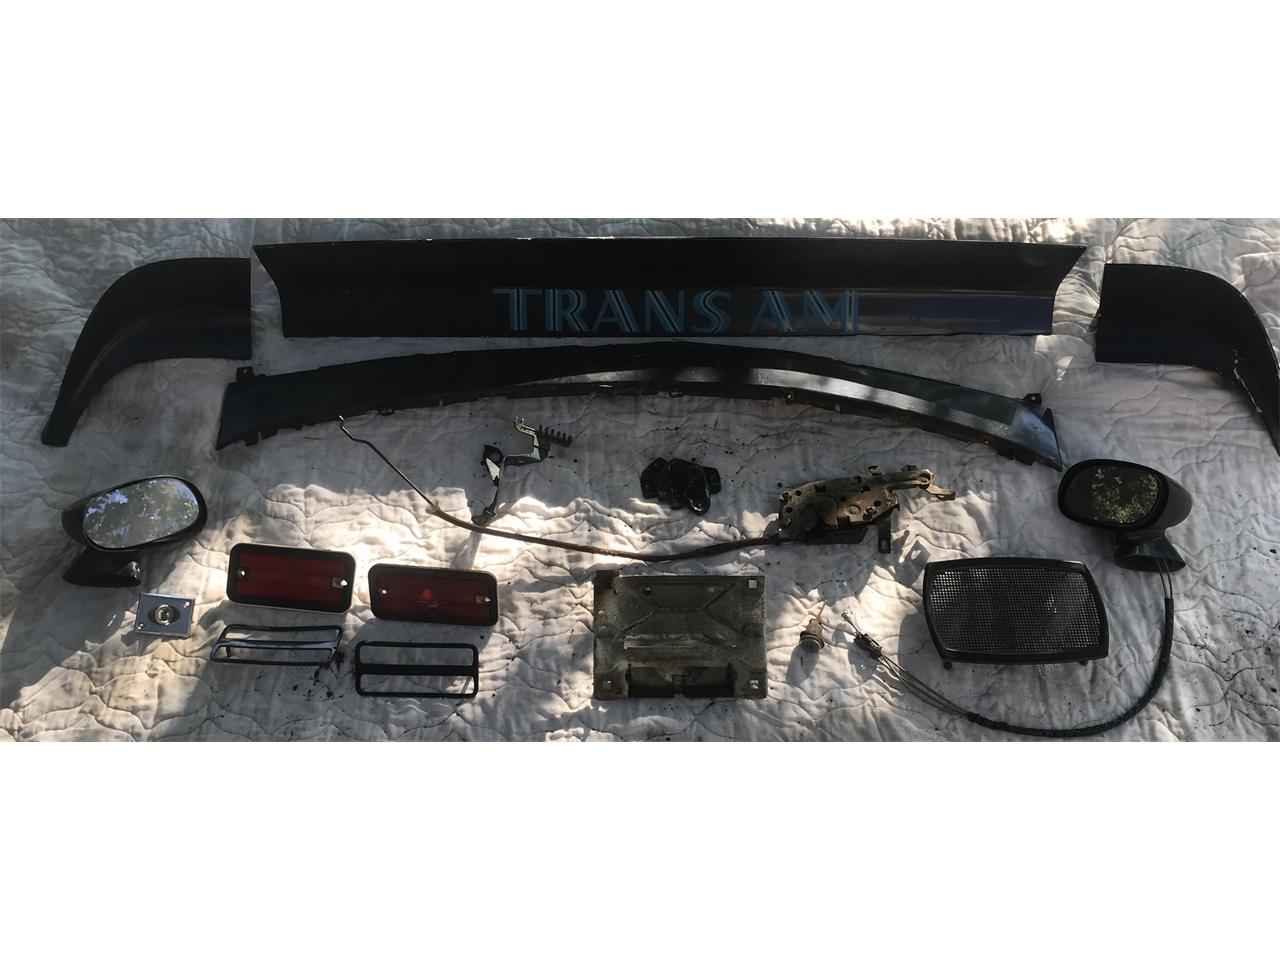 1974 Pontiac Firebird Trans Am (CC-1254143) for sale in Arlington Heights, Illinois